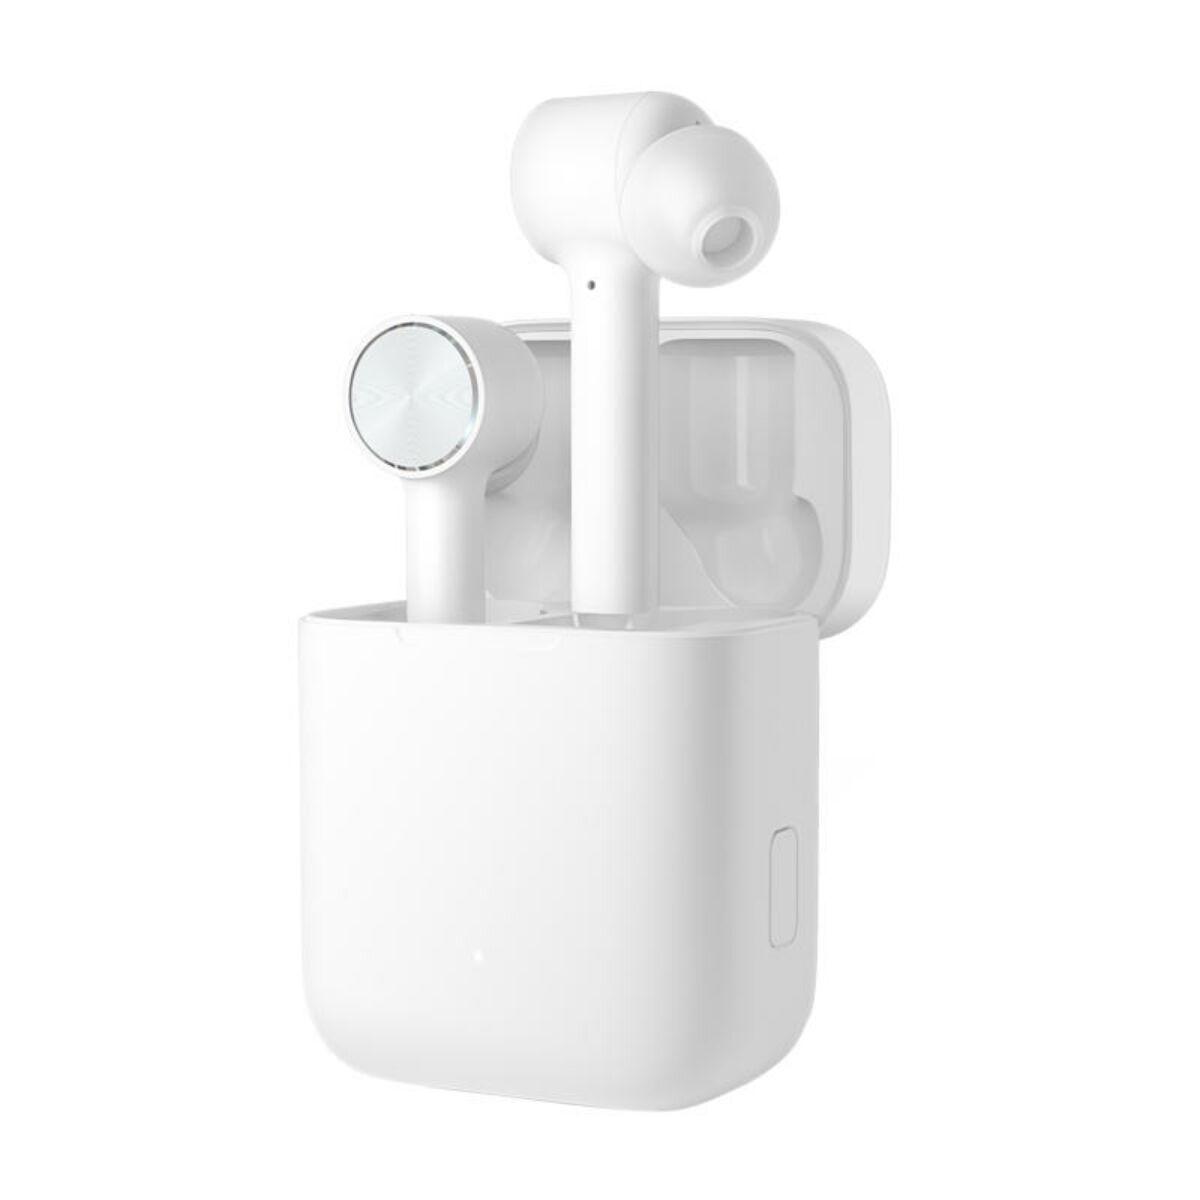 Xiaomi Mi True Wireless fülhallgató Lite, fehér EU TWSEJ03WM/BHR4090GL